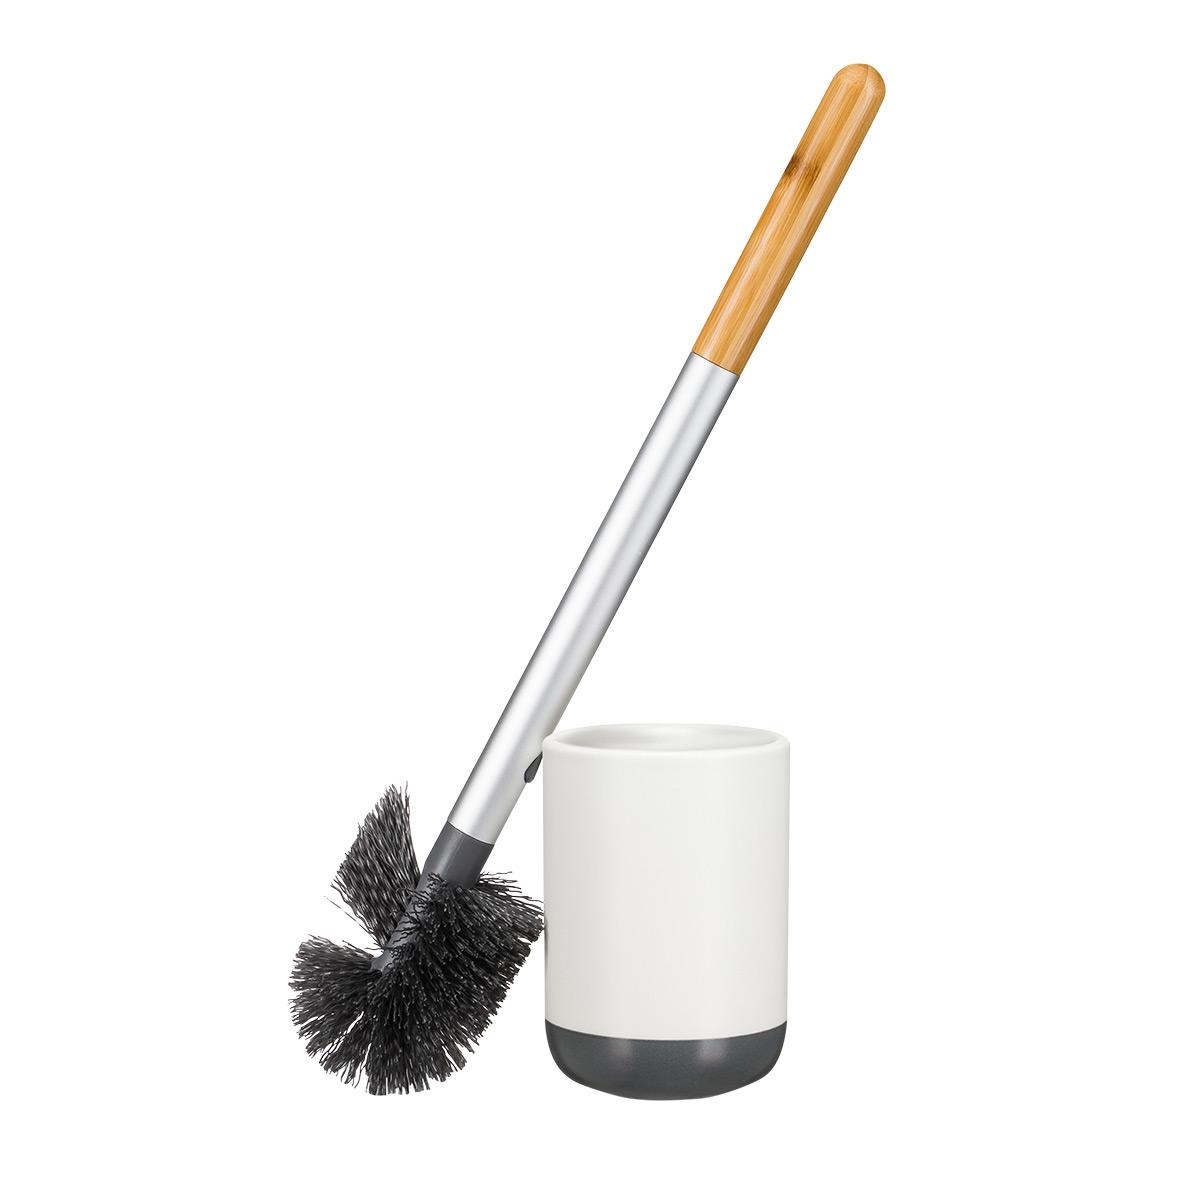 Full Circle Scrub Queen Toilet Brush